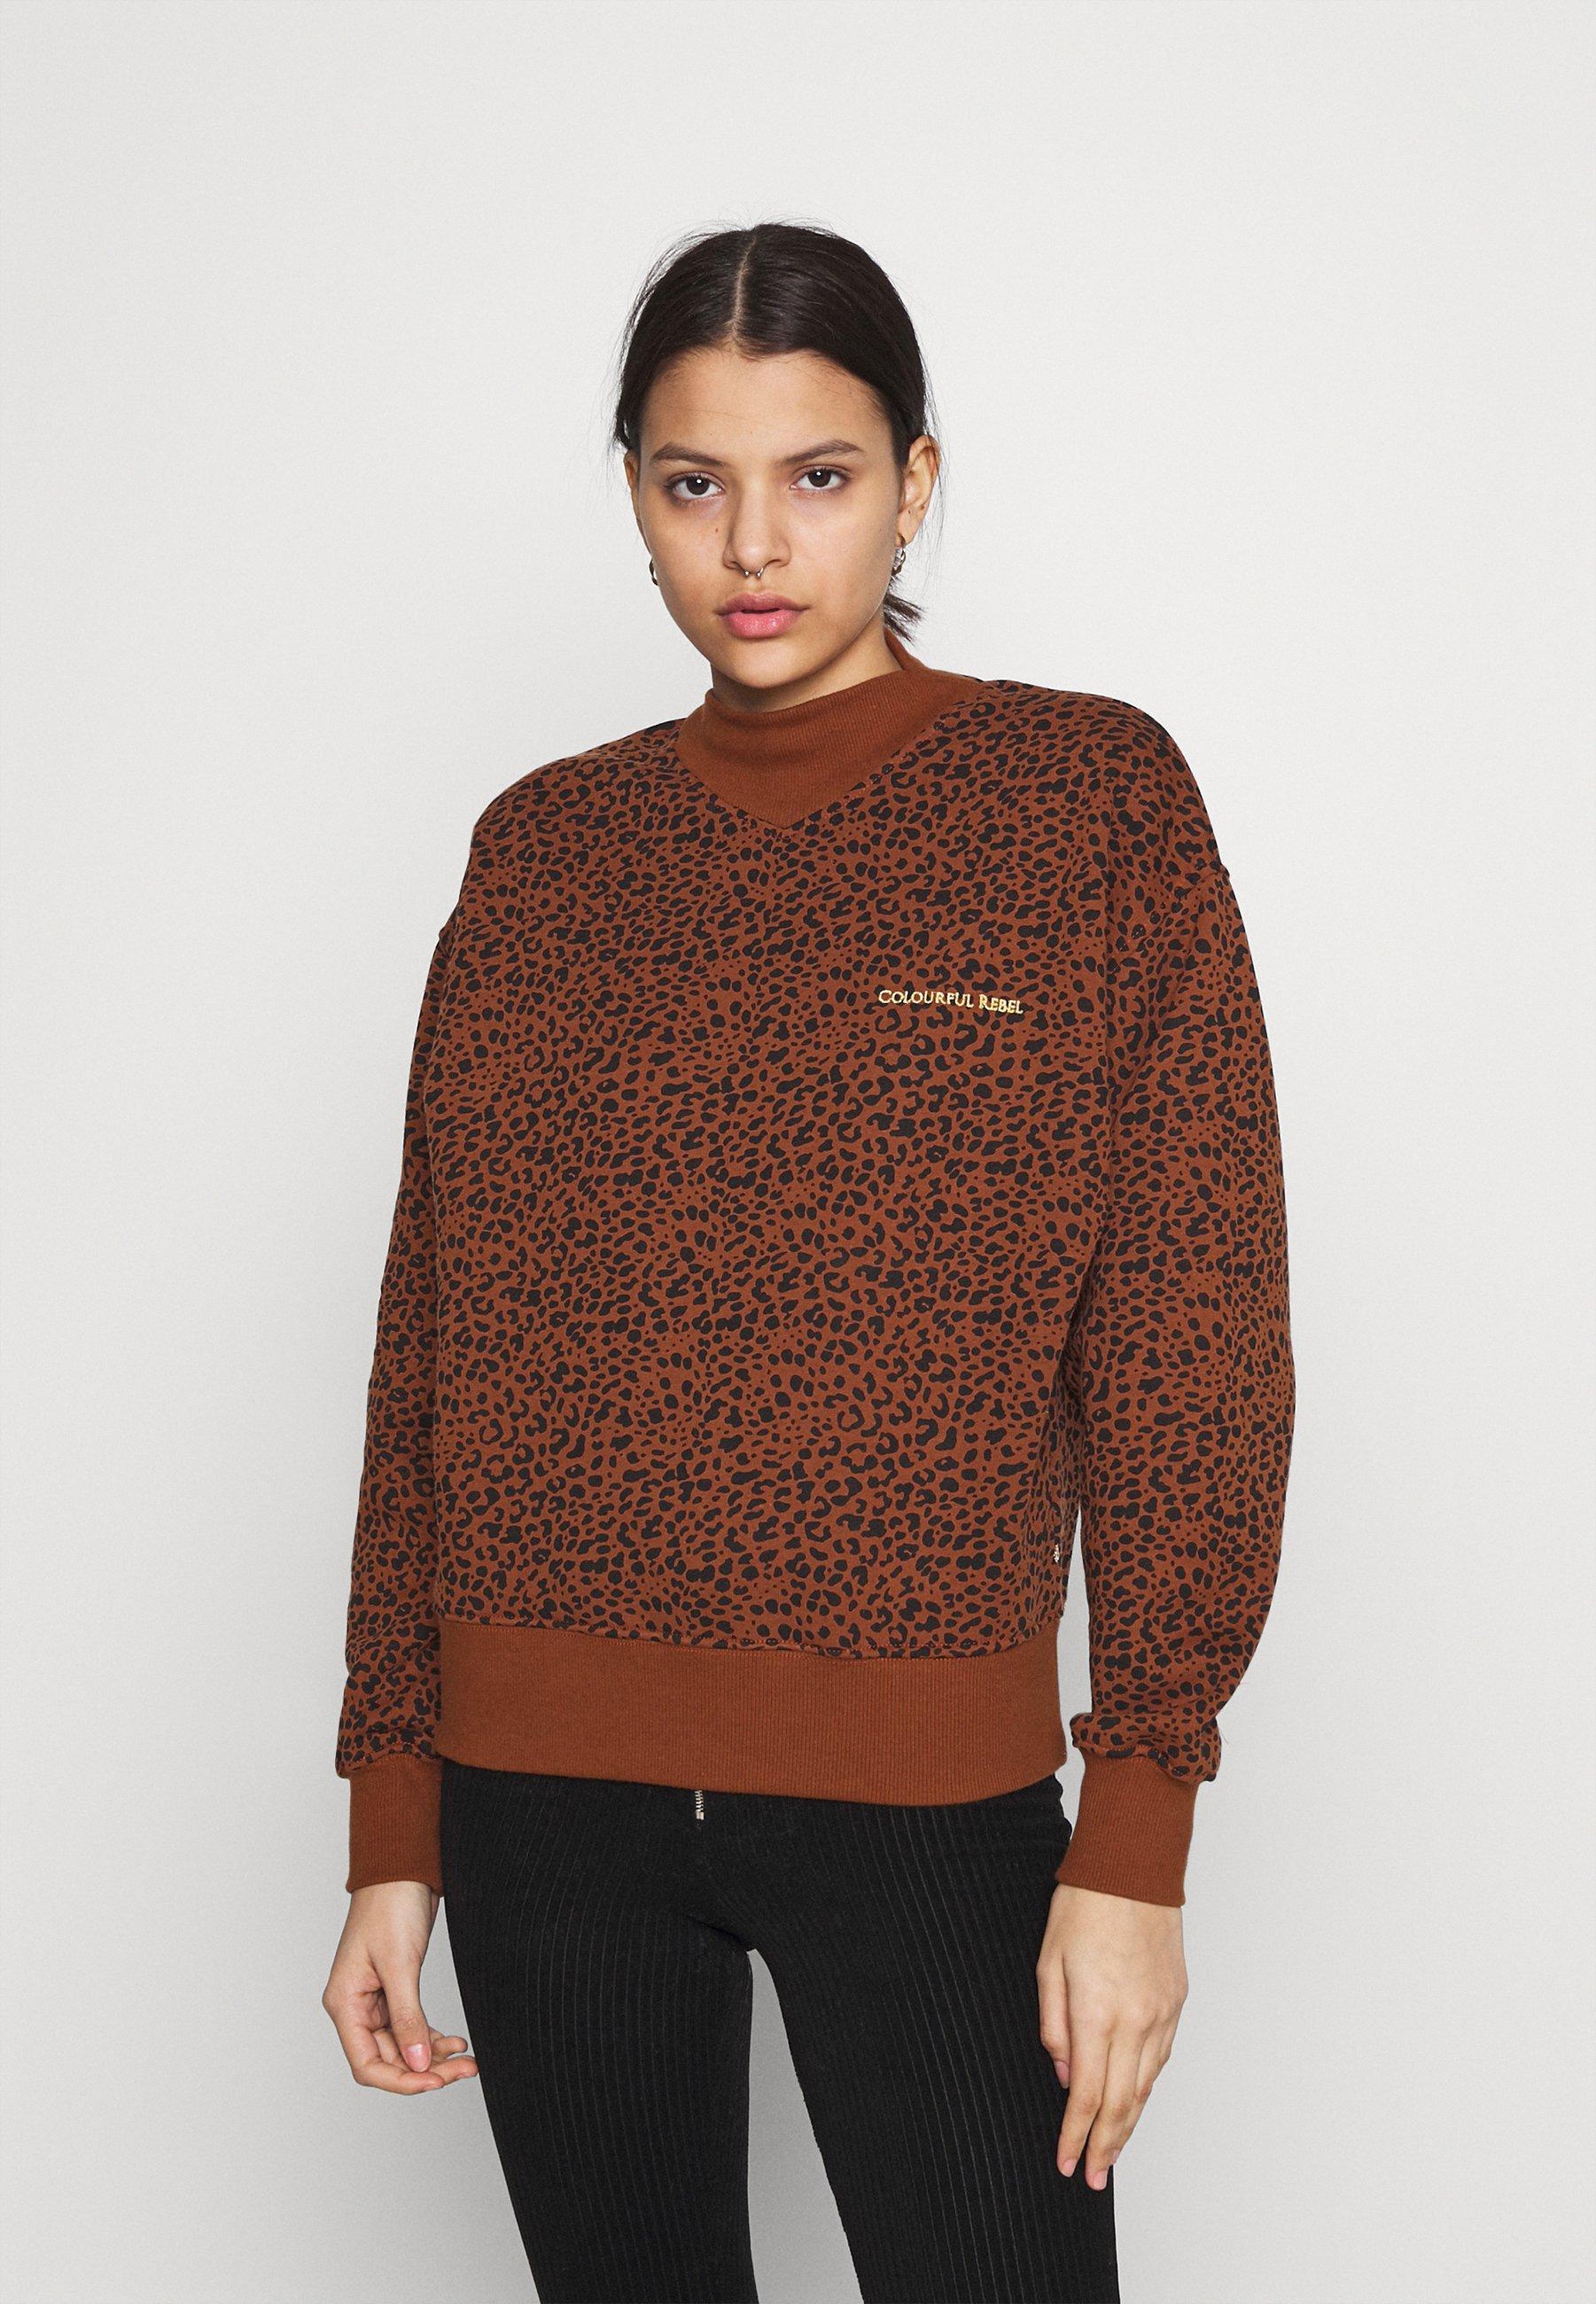 Women LEOPARD LOOSE FIT HIGH NECK GINGER BREAD - Sweatshirt